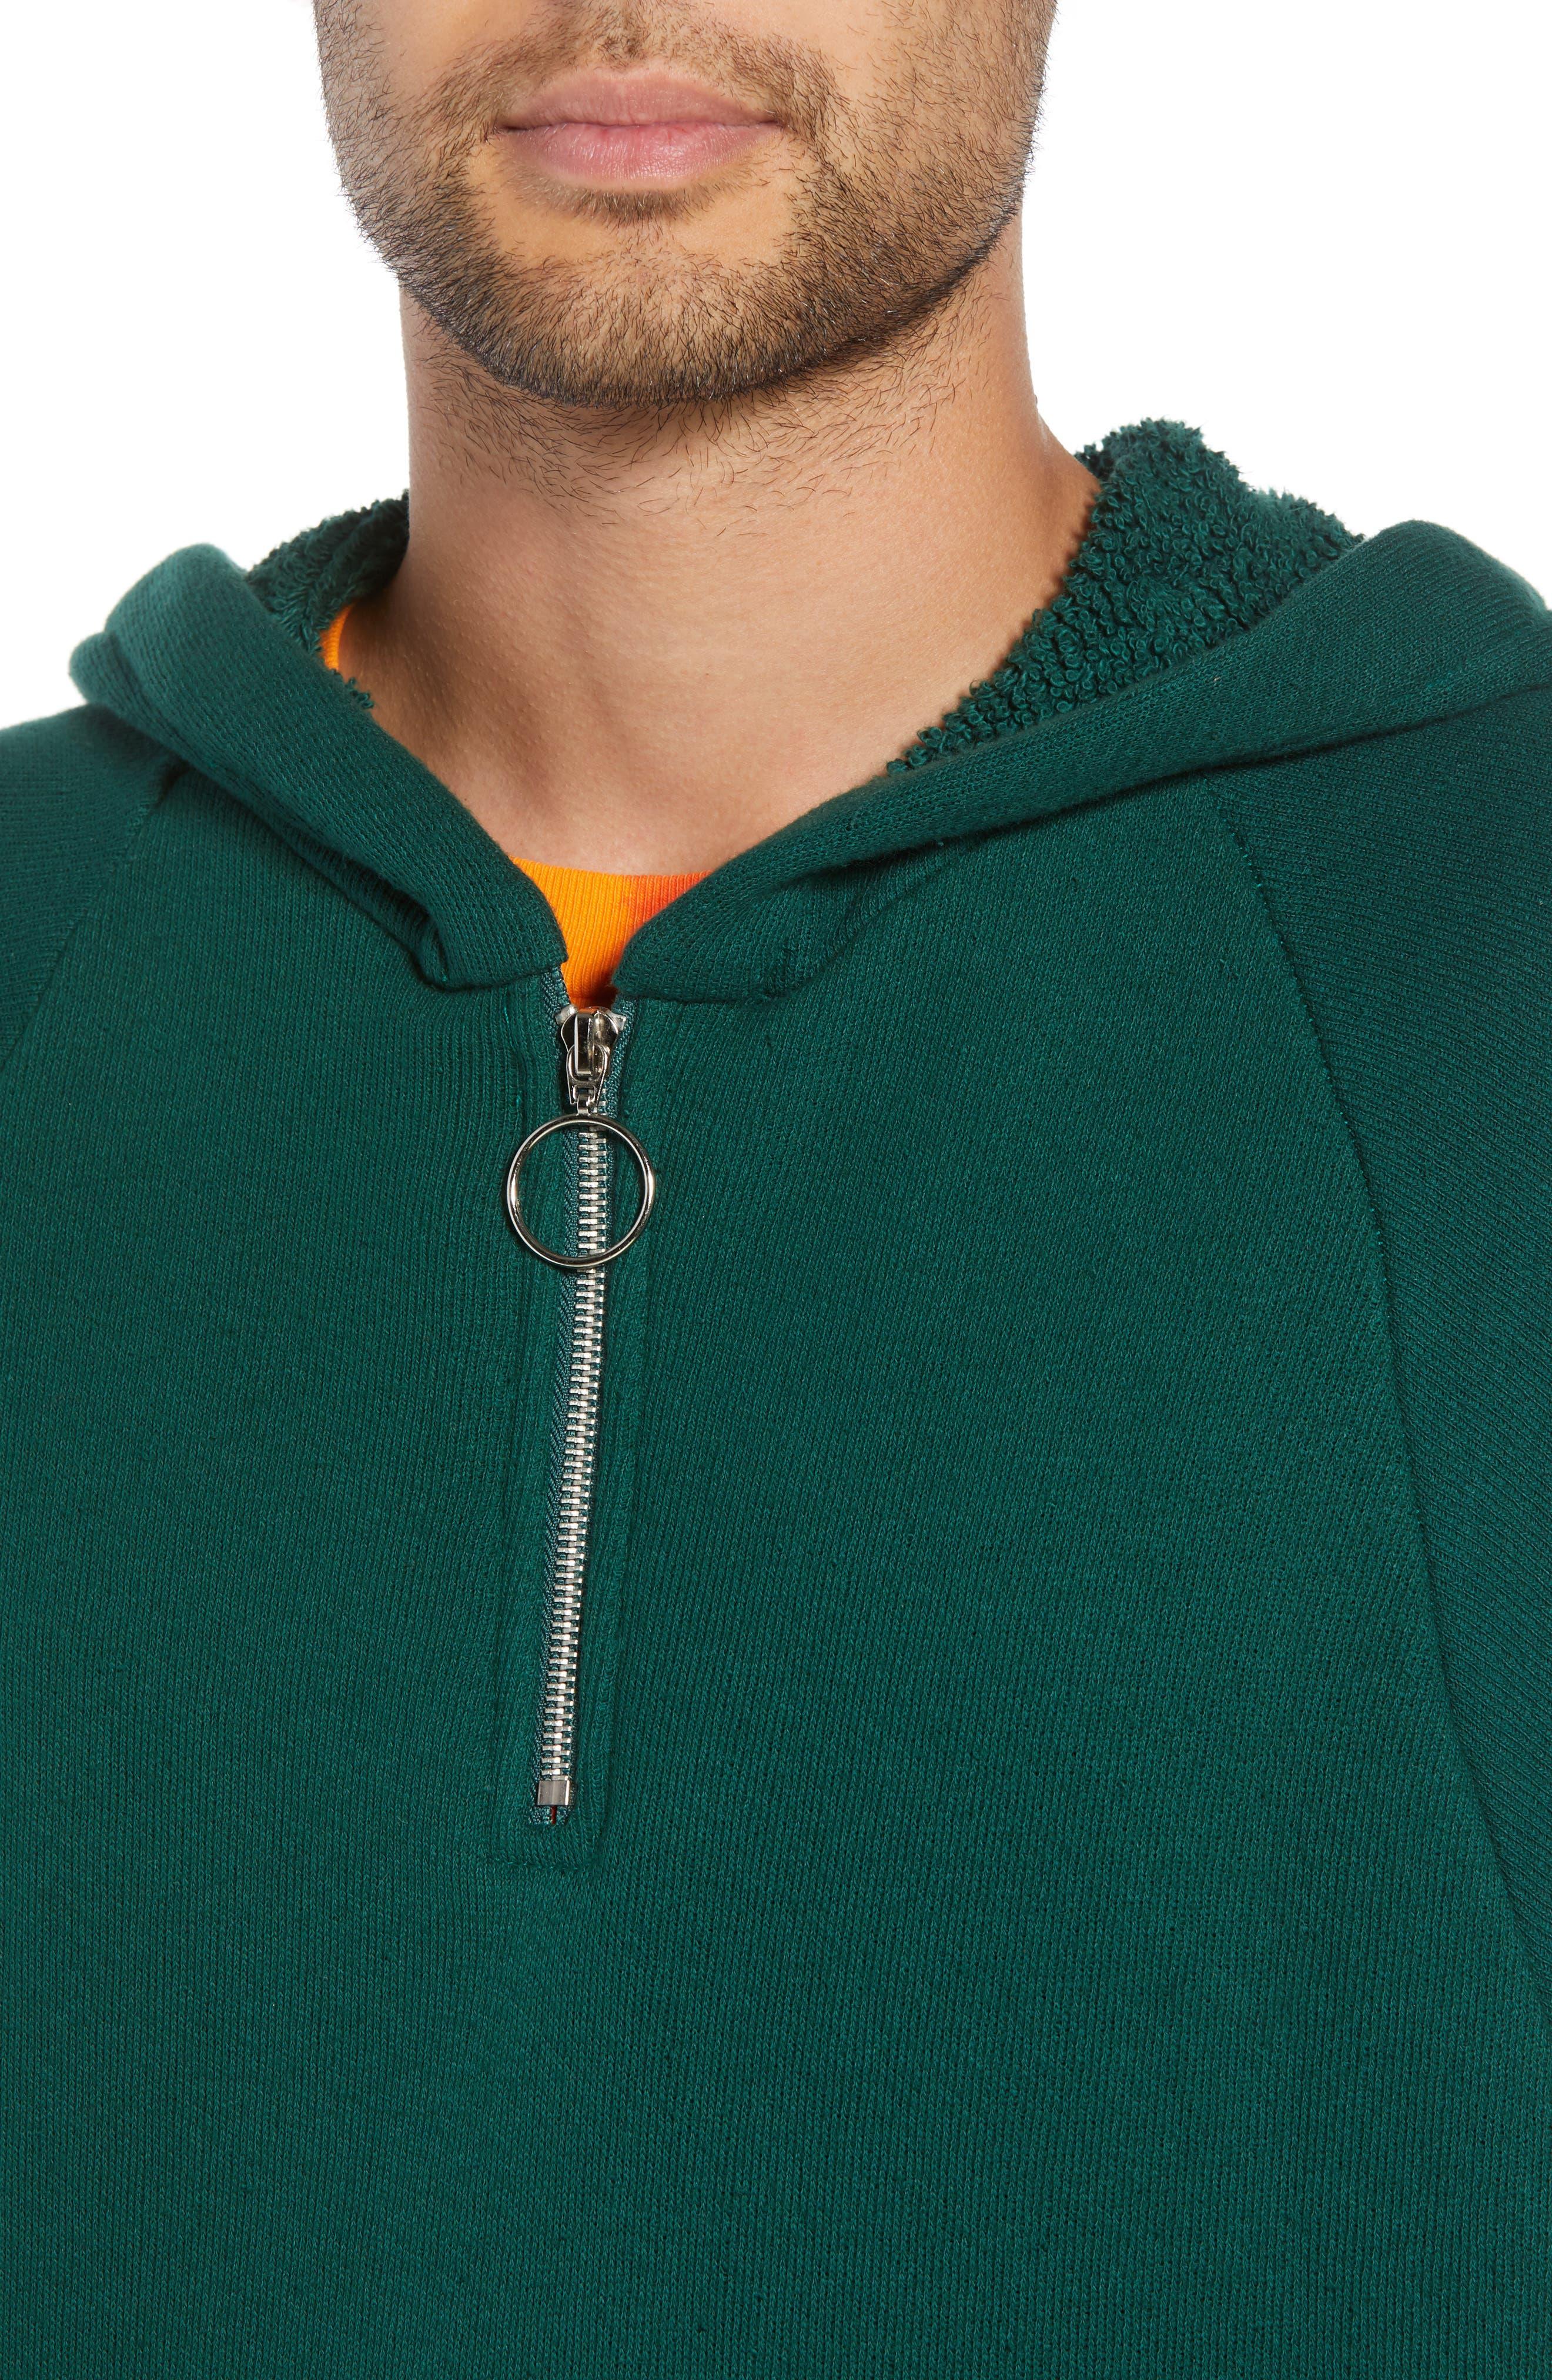 Warwick Quarter-Zip Hoodie Sweatshirt,                             Alternate thumbnail 4, color,                             HUNTER GREEN